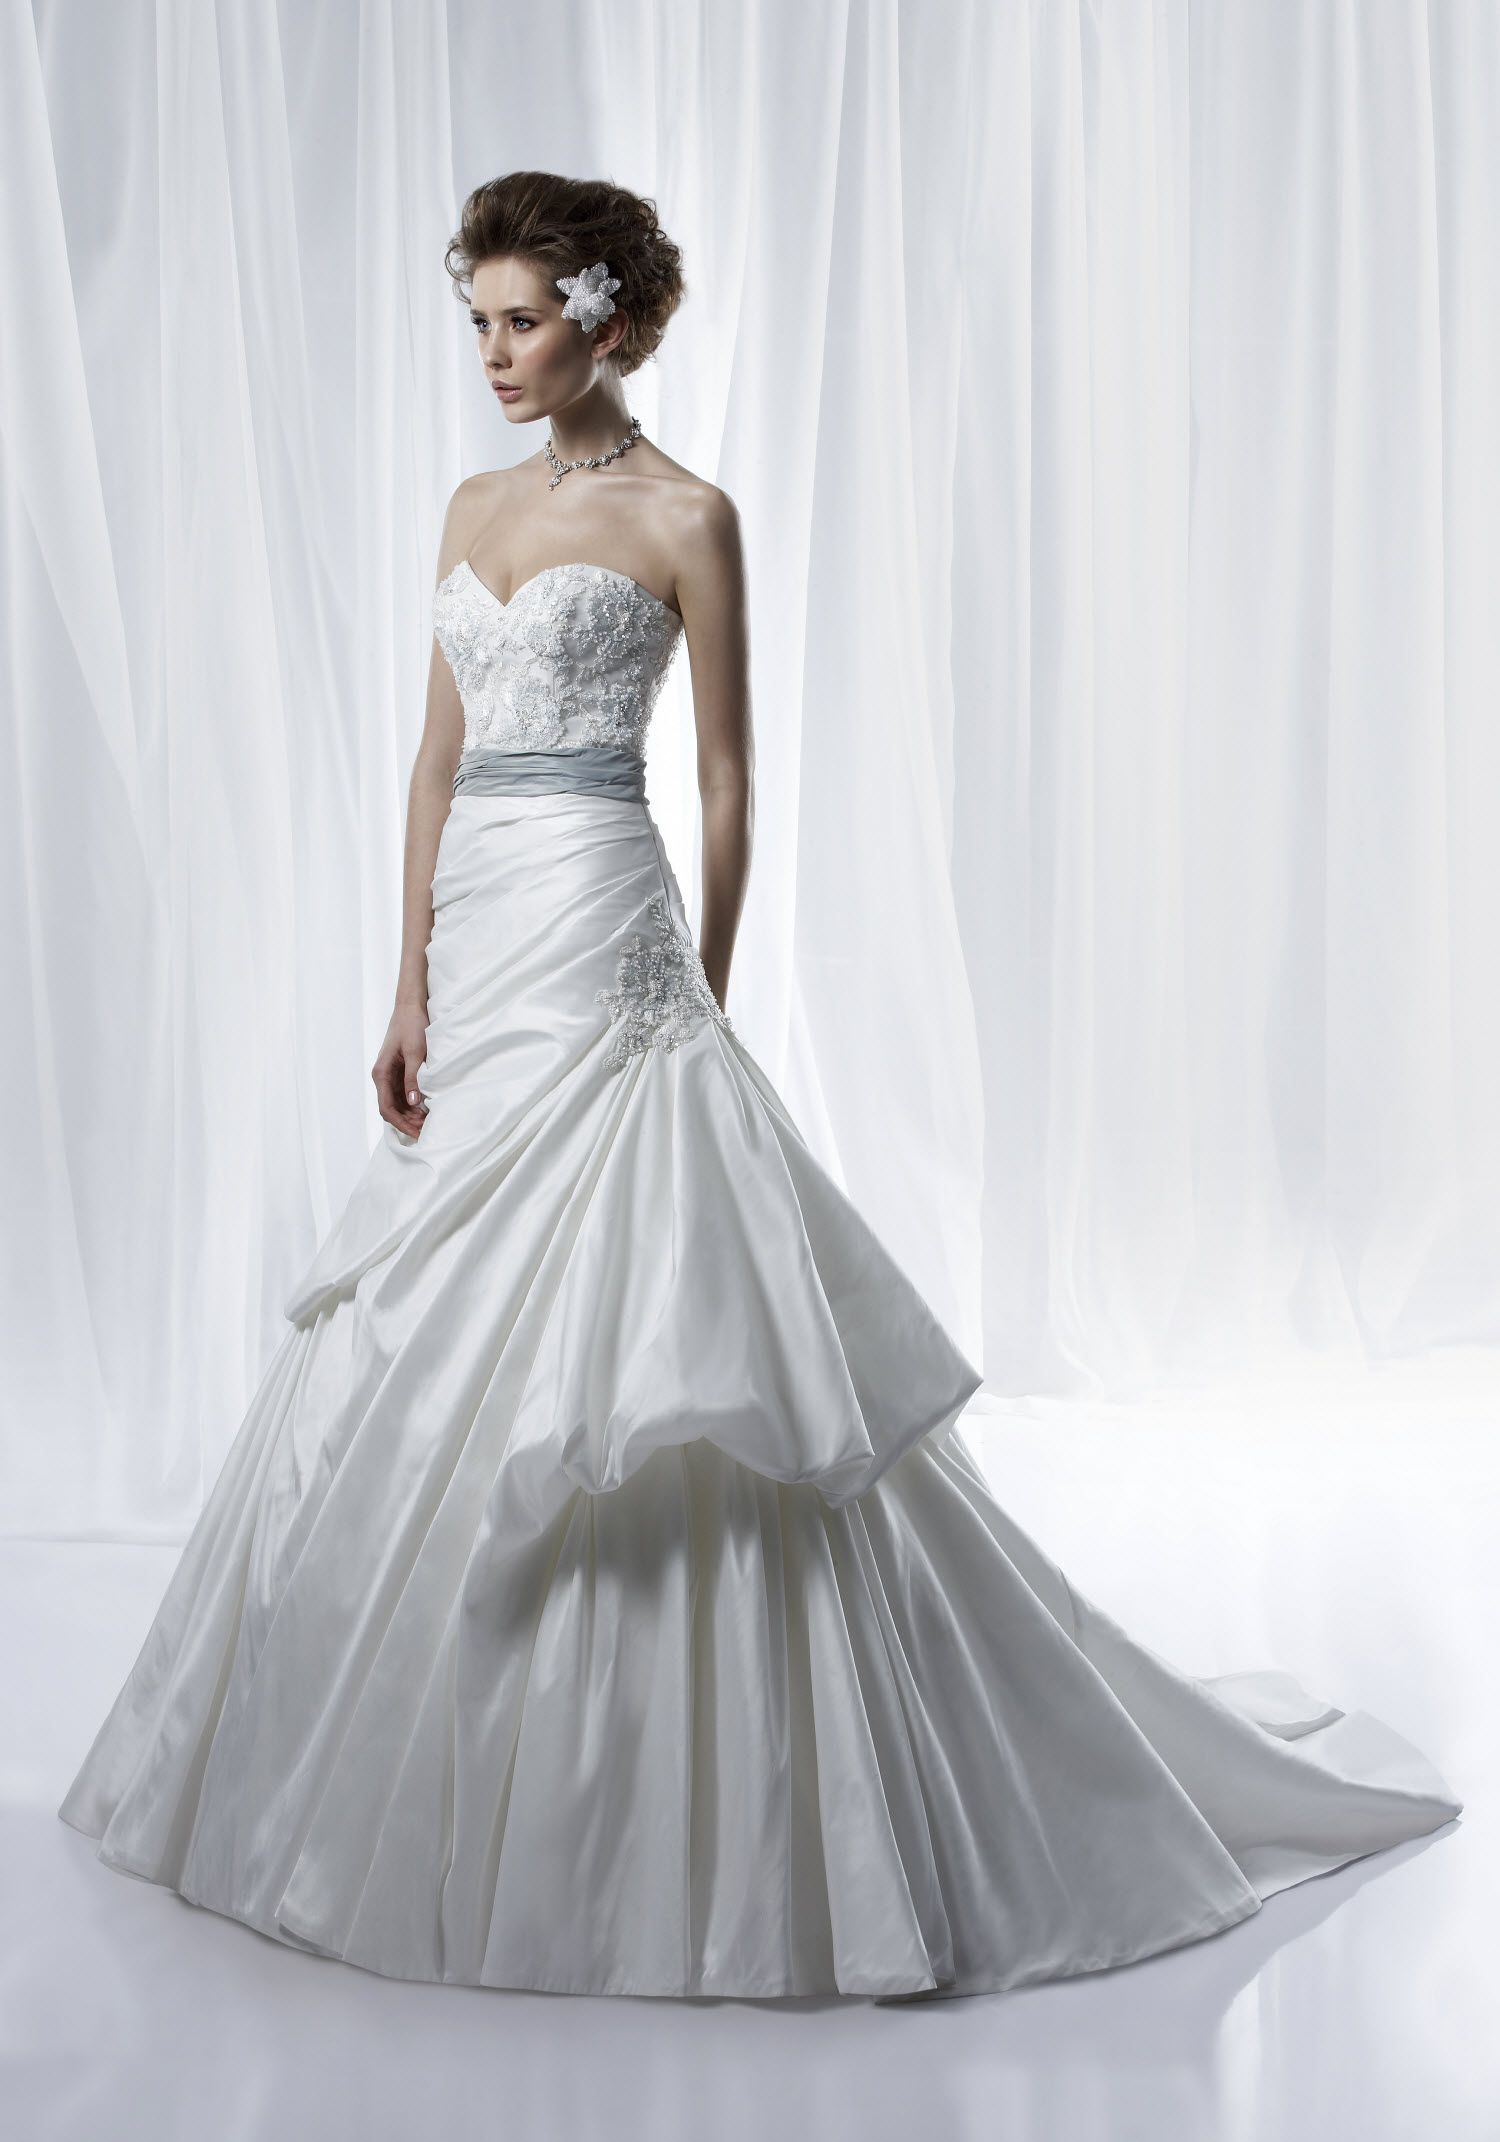 Sweetheart ball gown wedding dress  Ivory sweetheart ball gown wedding dress with modern bustle and silk